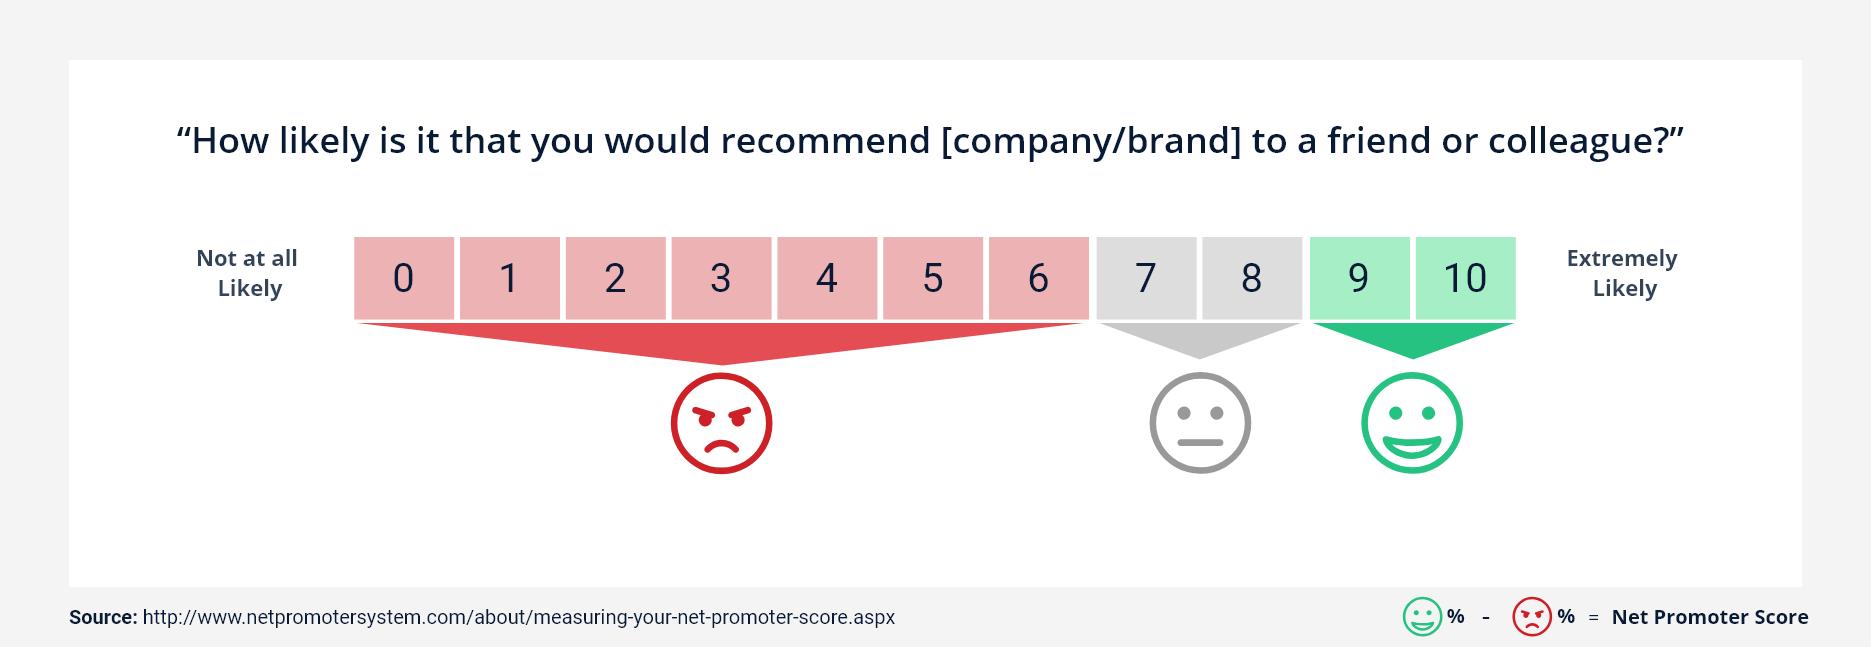 Net promoter score.png